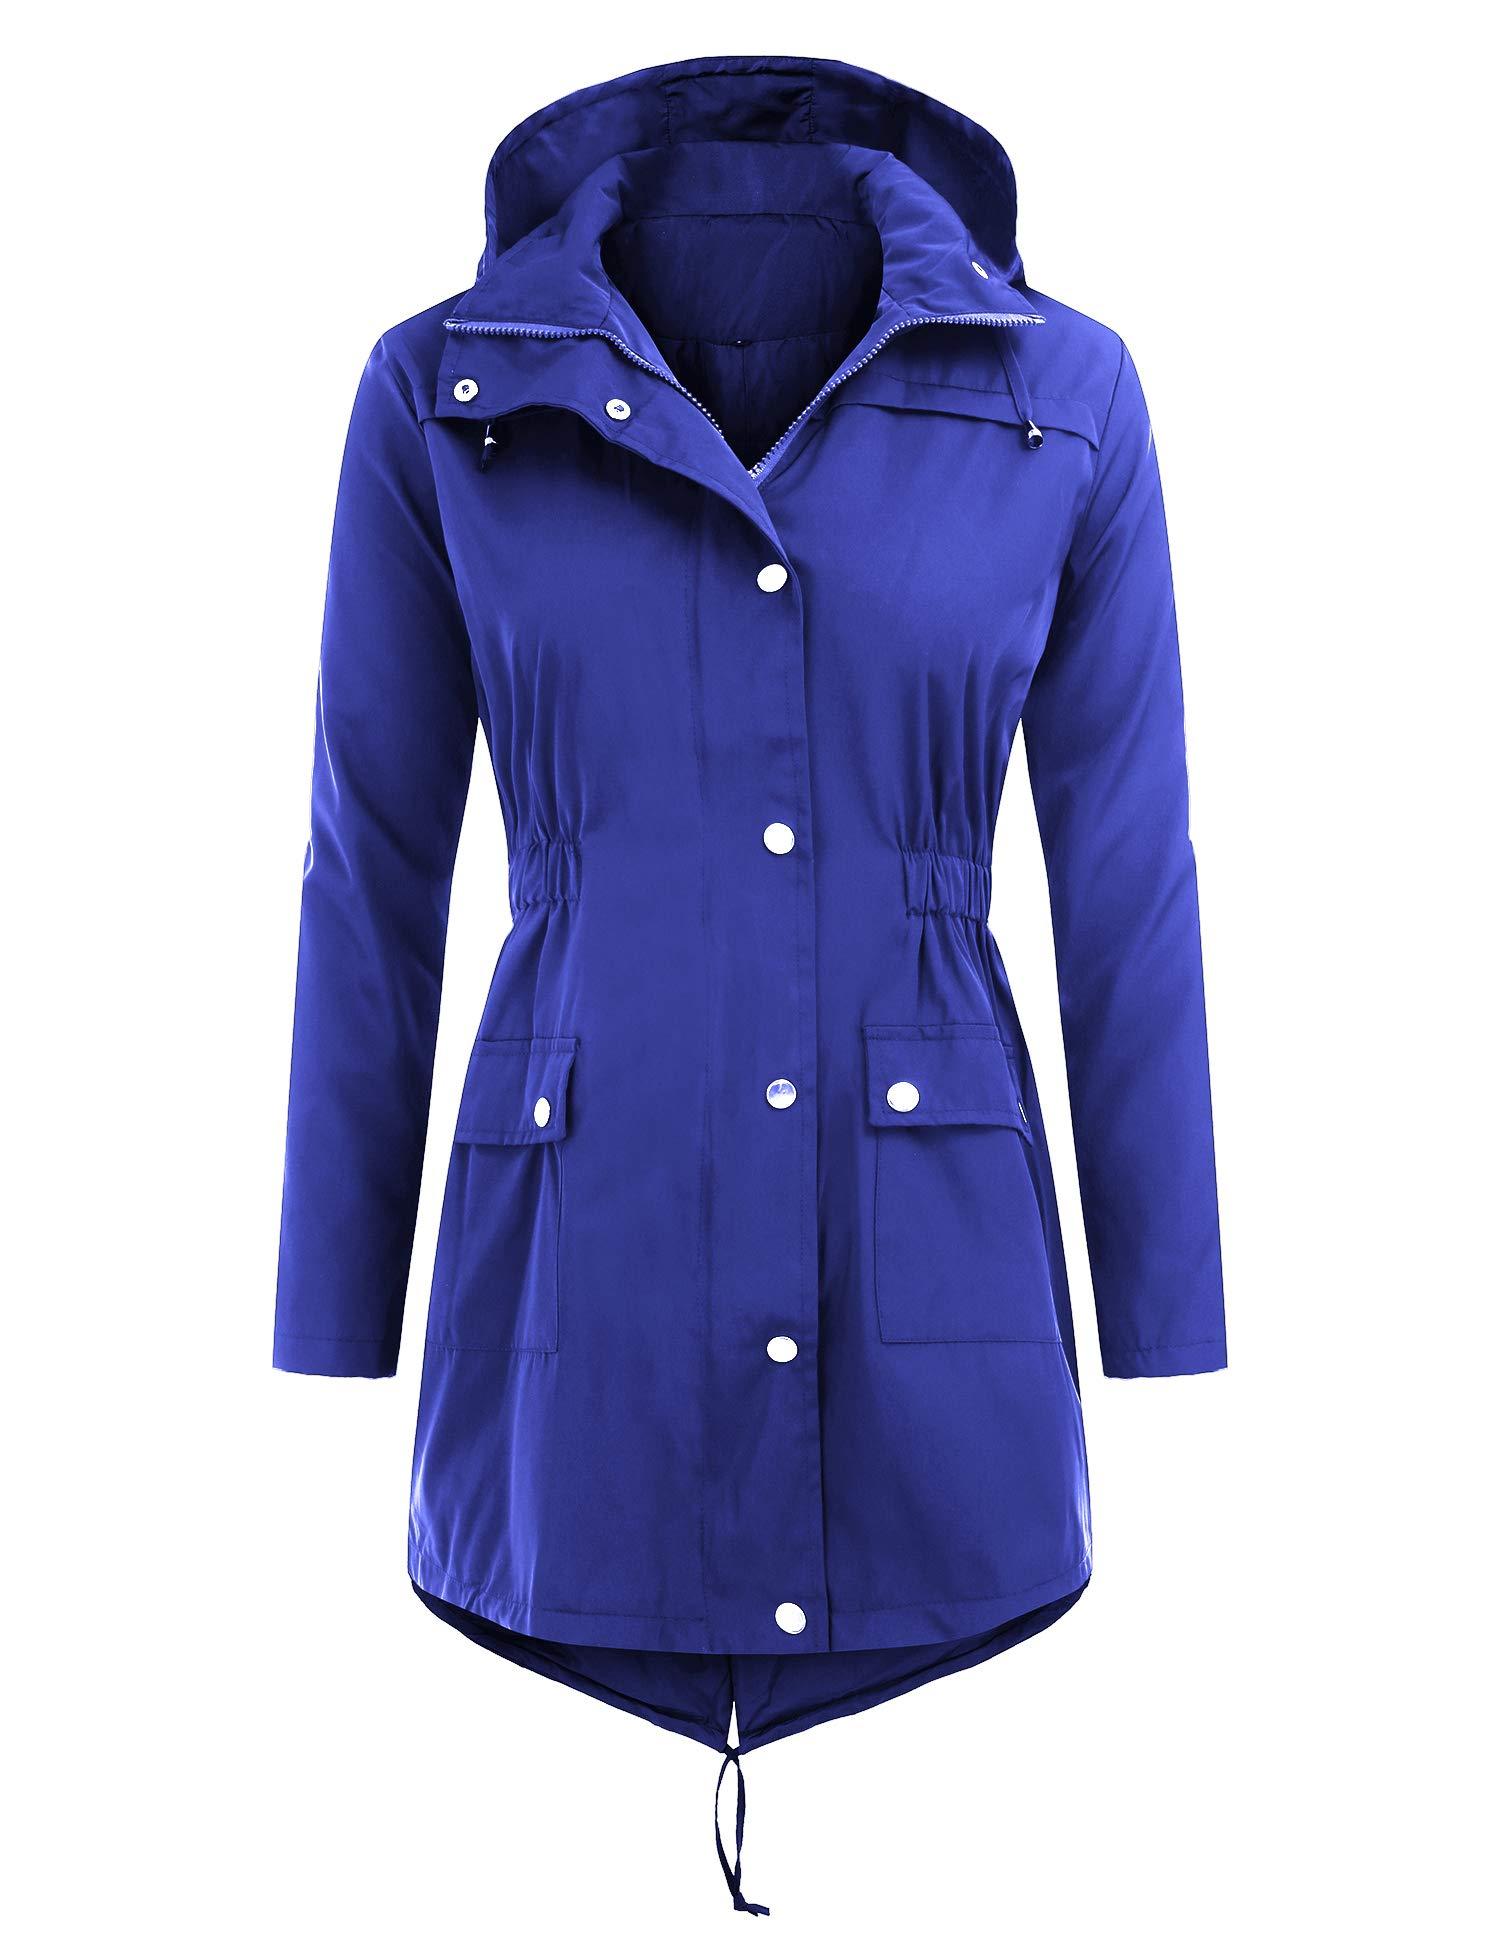 Uniboutique Raincoat Waterproof Outdoor Hooded Lightweight Rain Jacket Windbreaker by Uniboutique (Image #1)